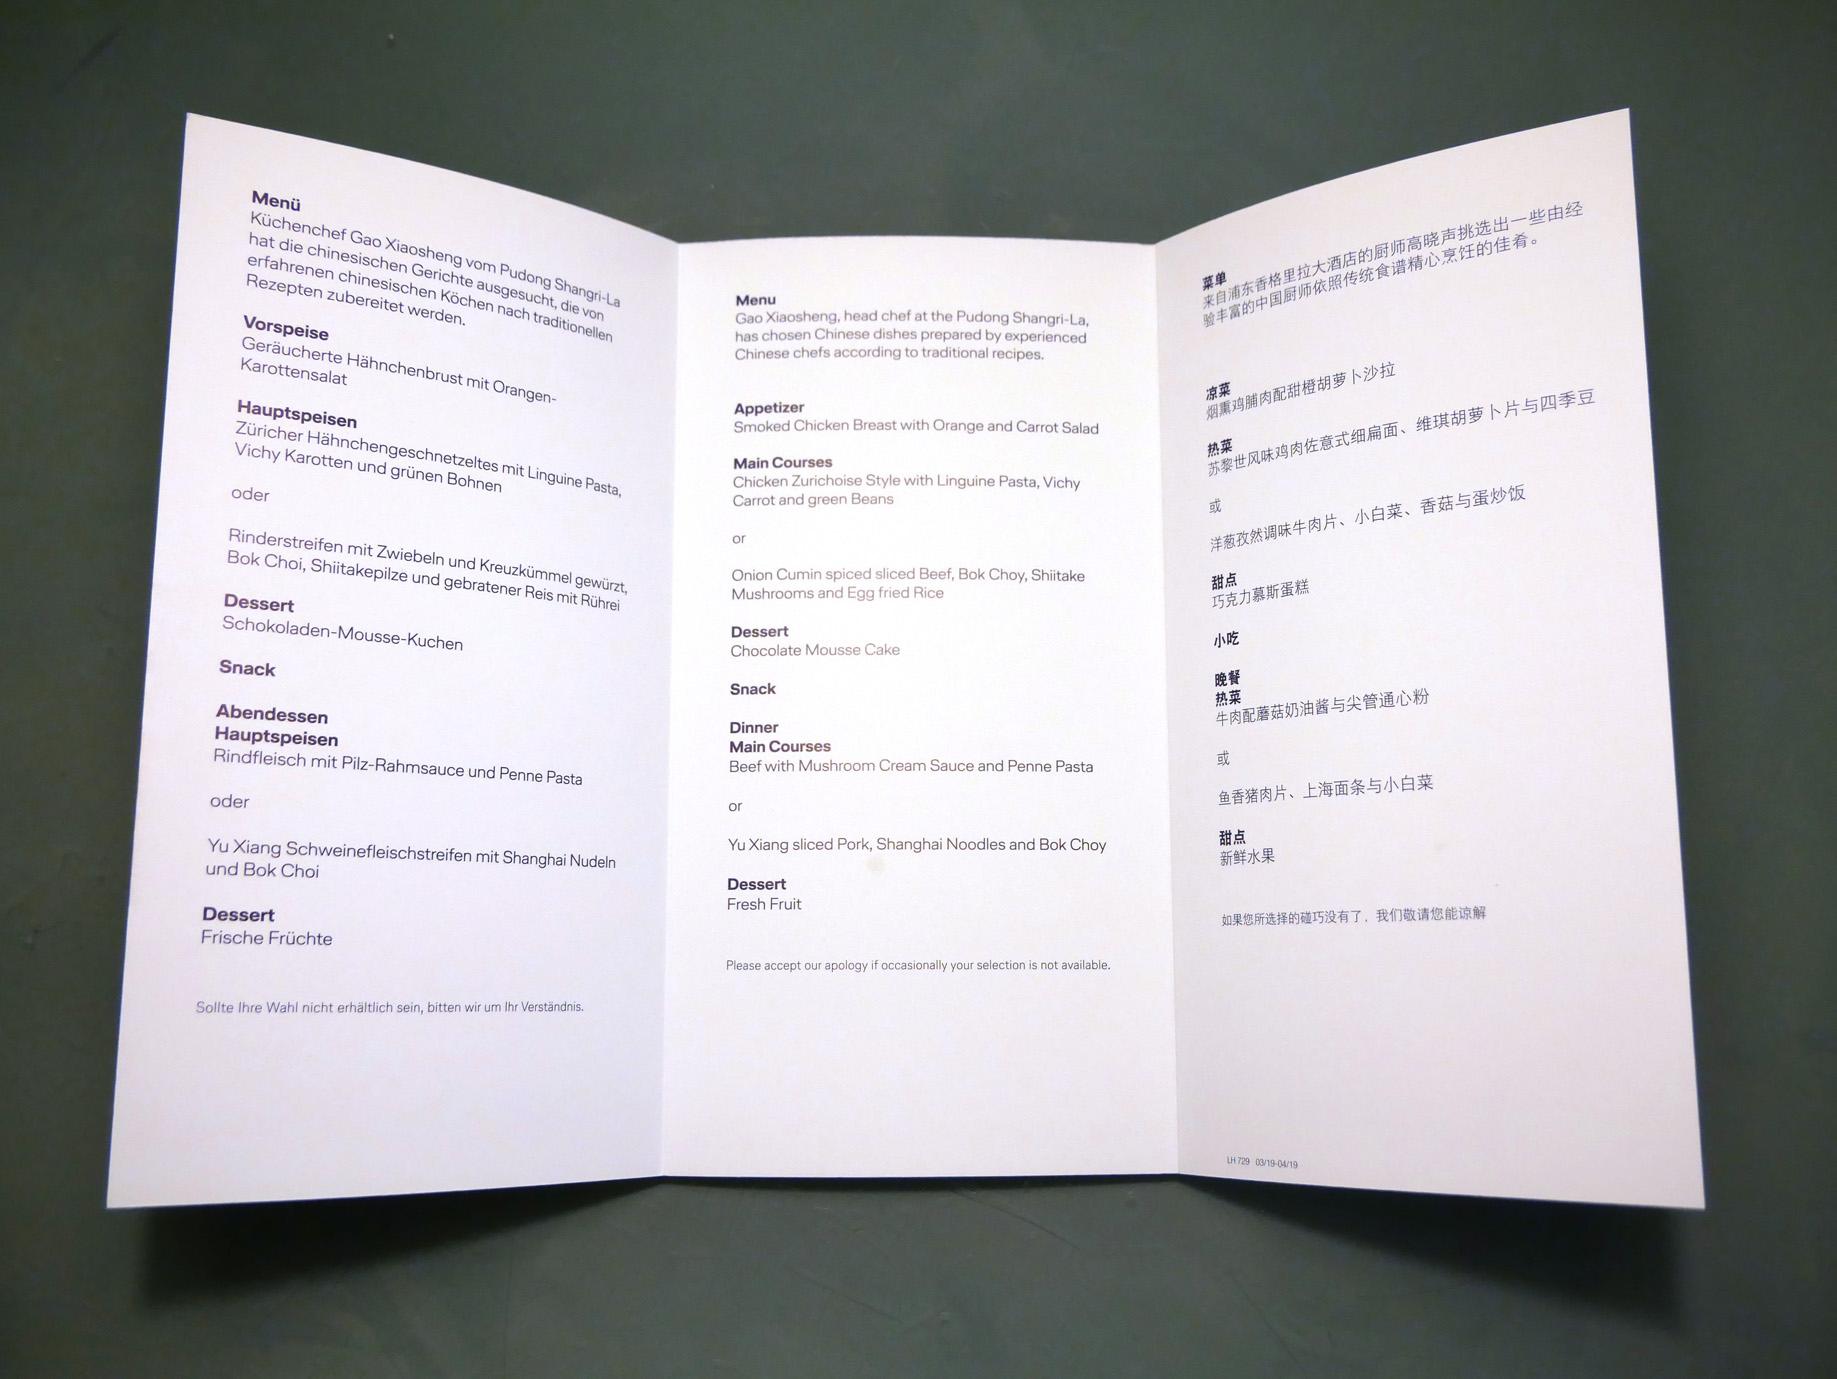 LH PVG-FRA menu.jpg